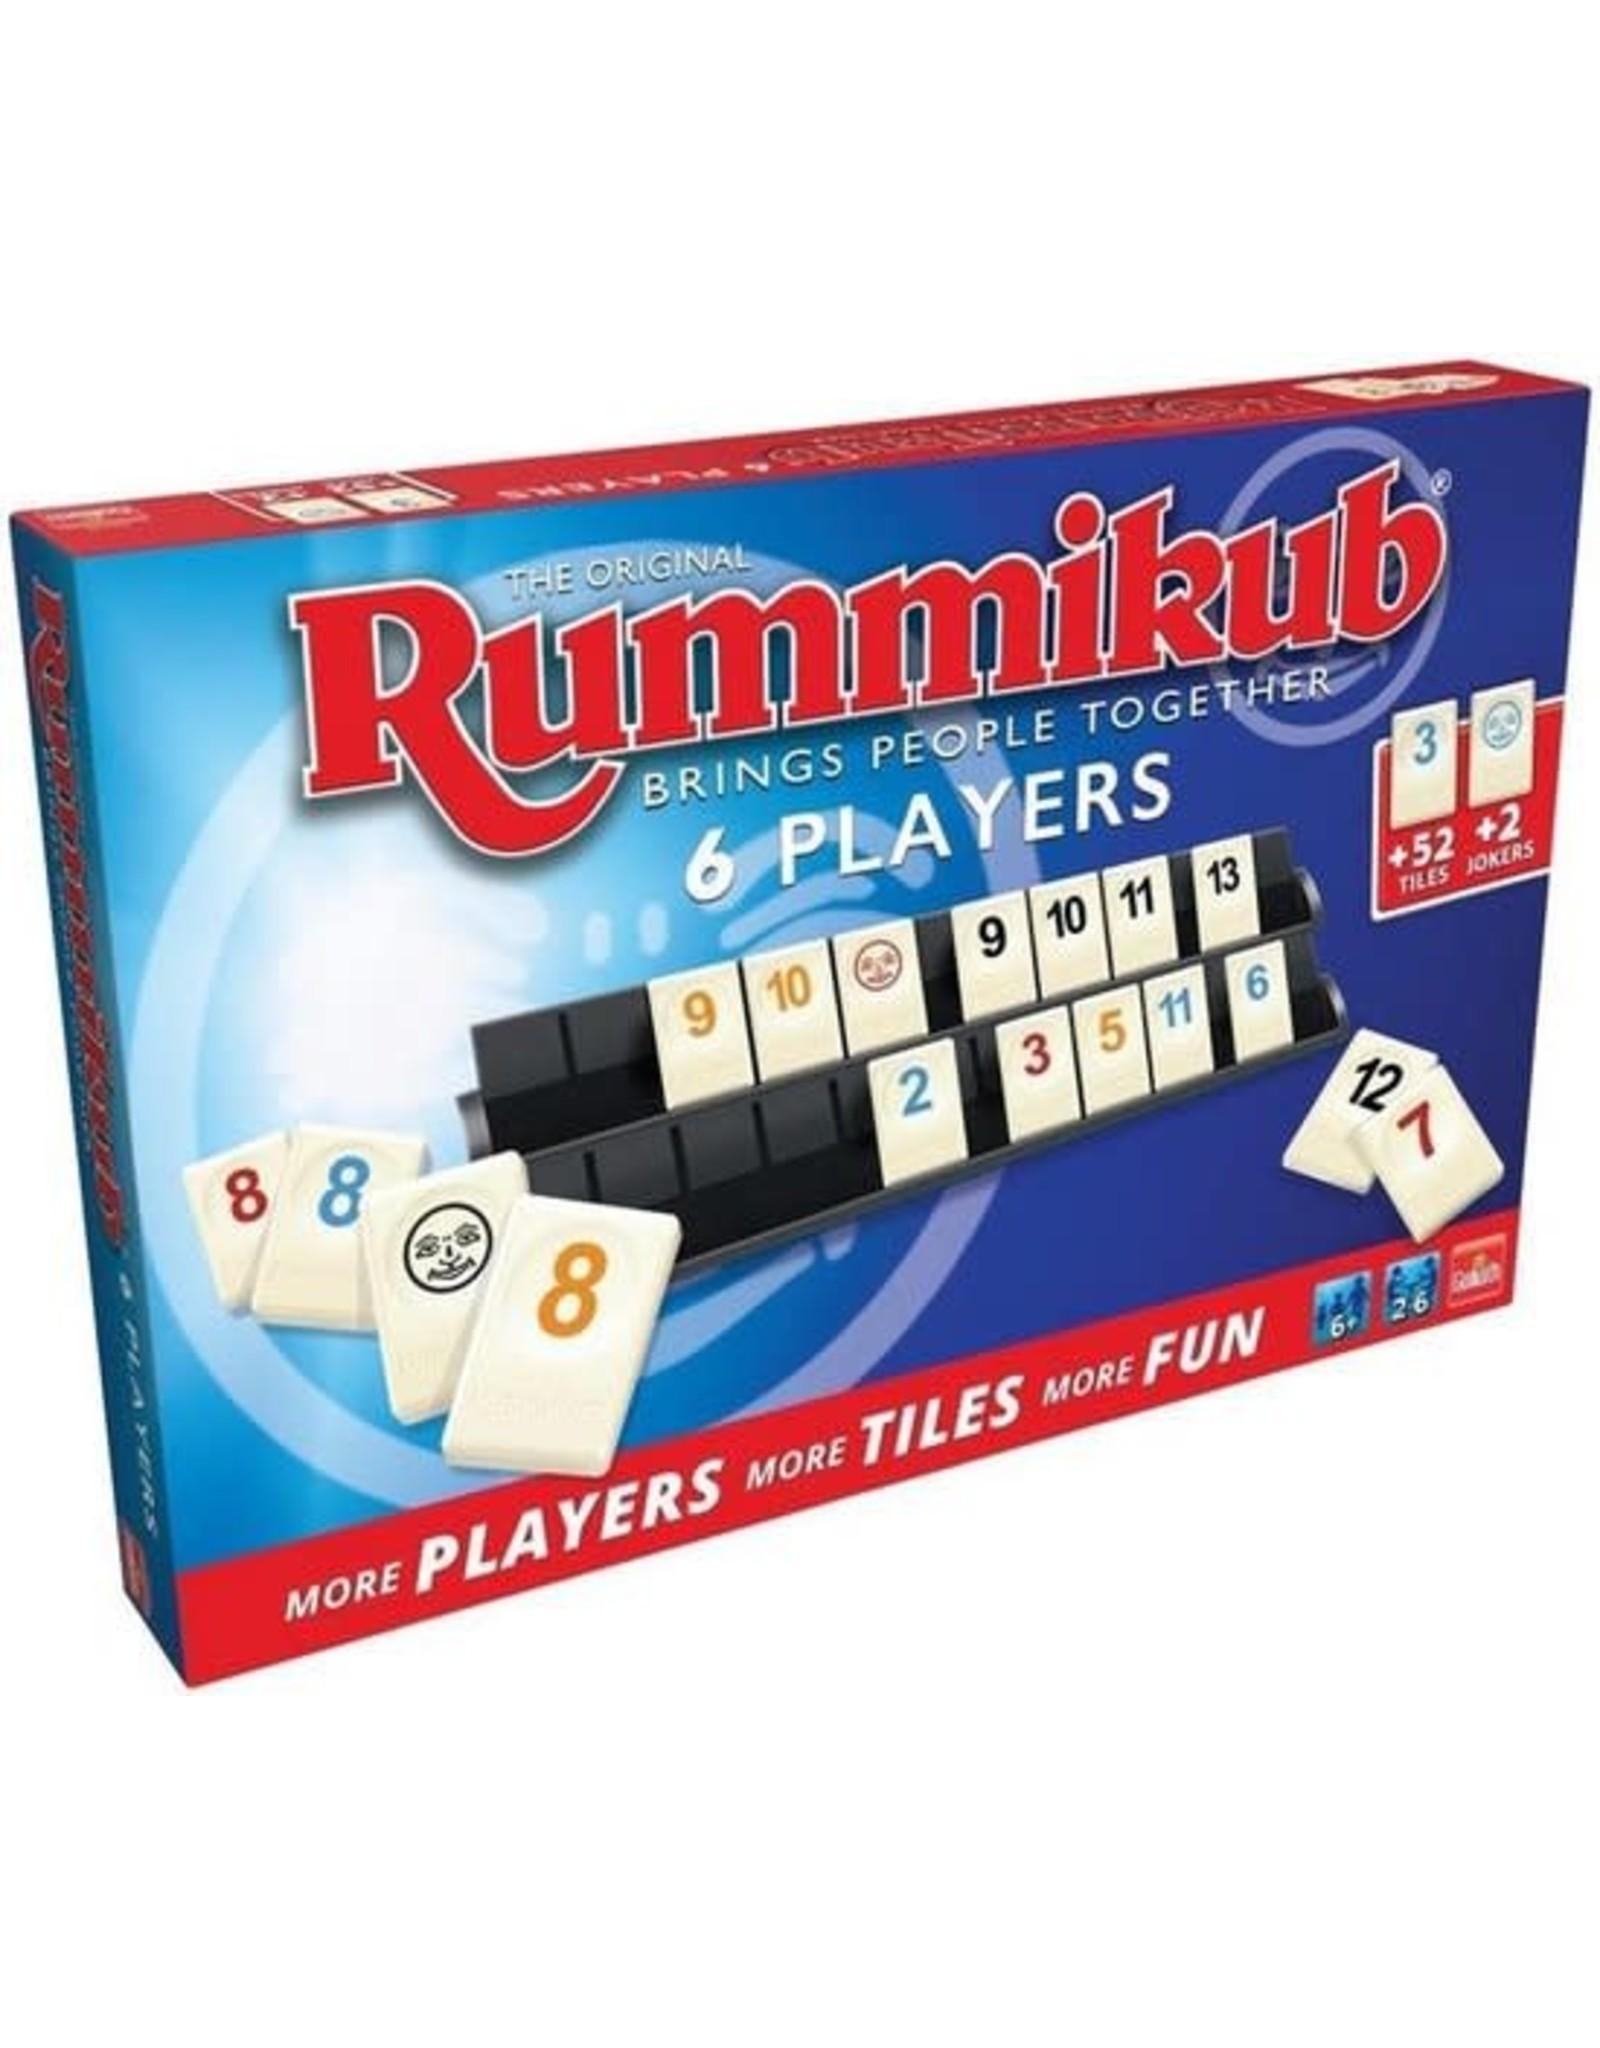 Goliath Rummikub XP 6 Players